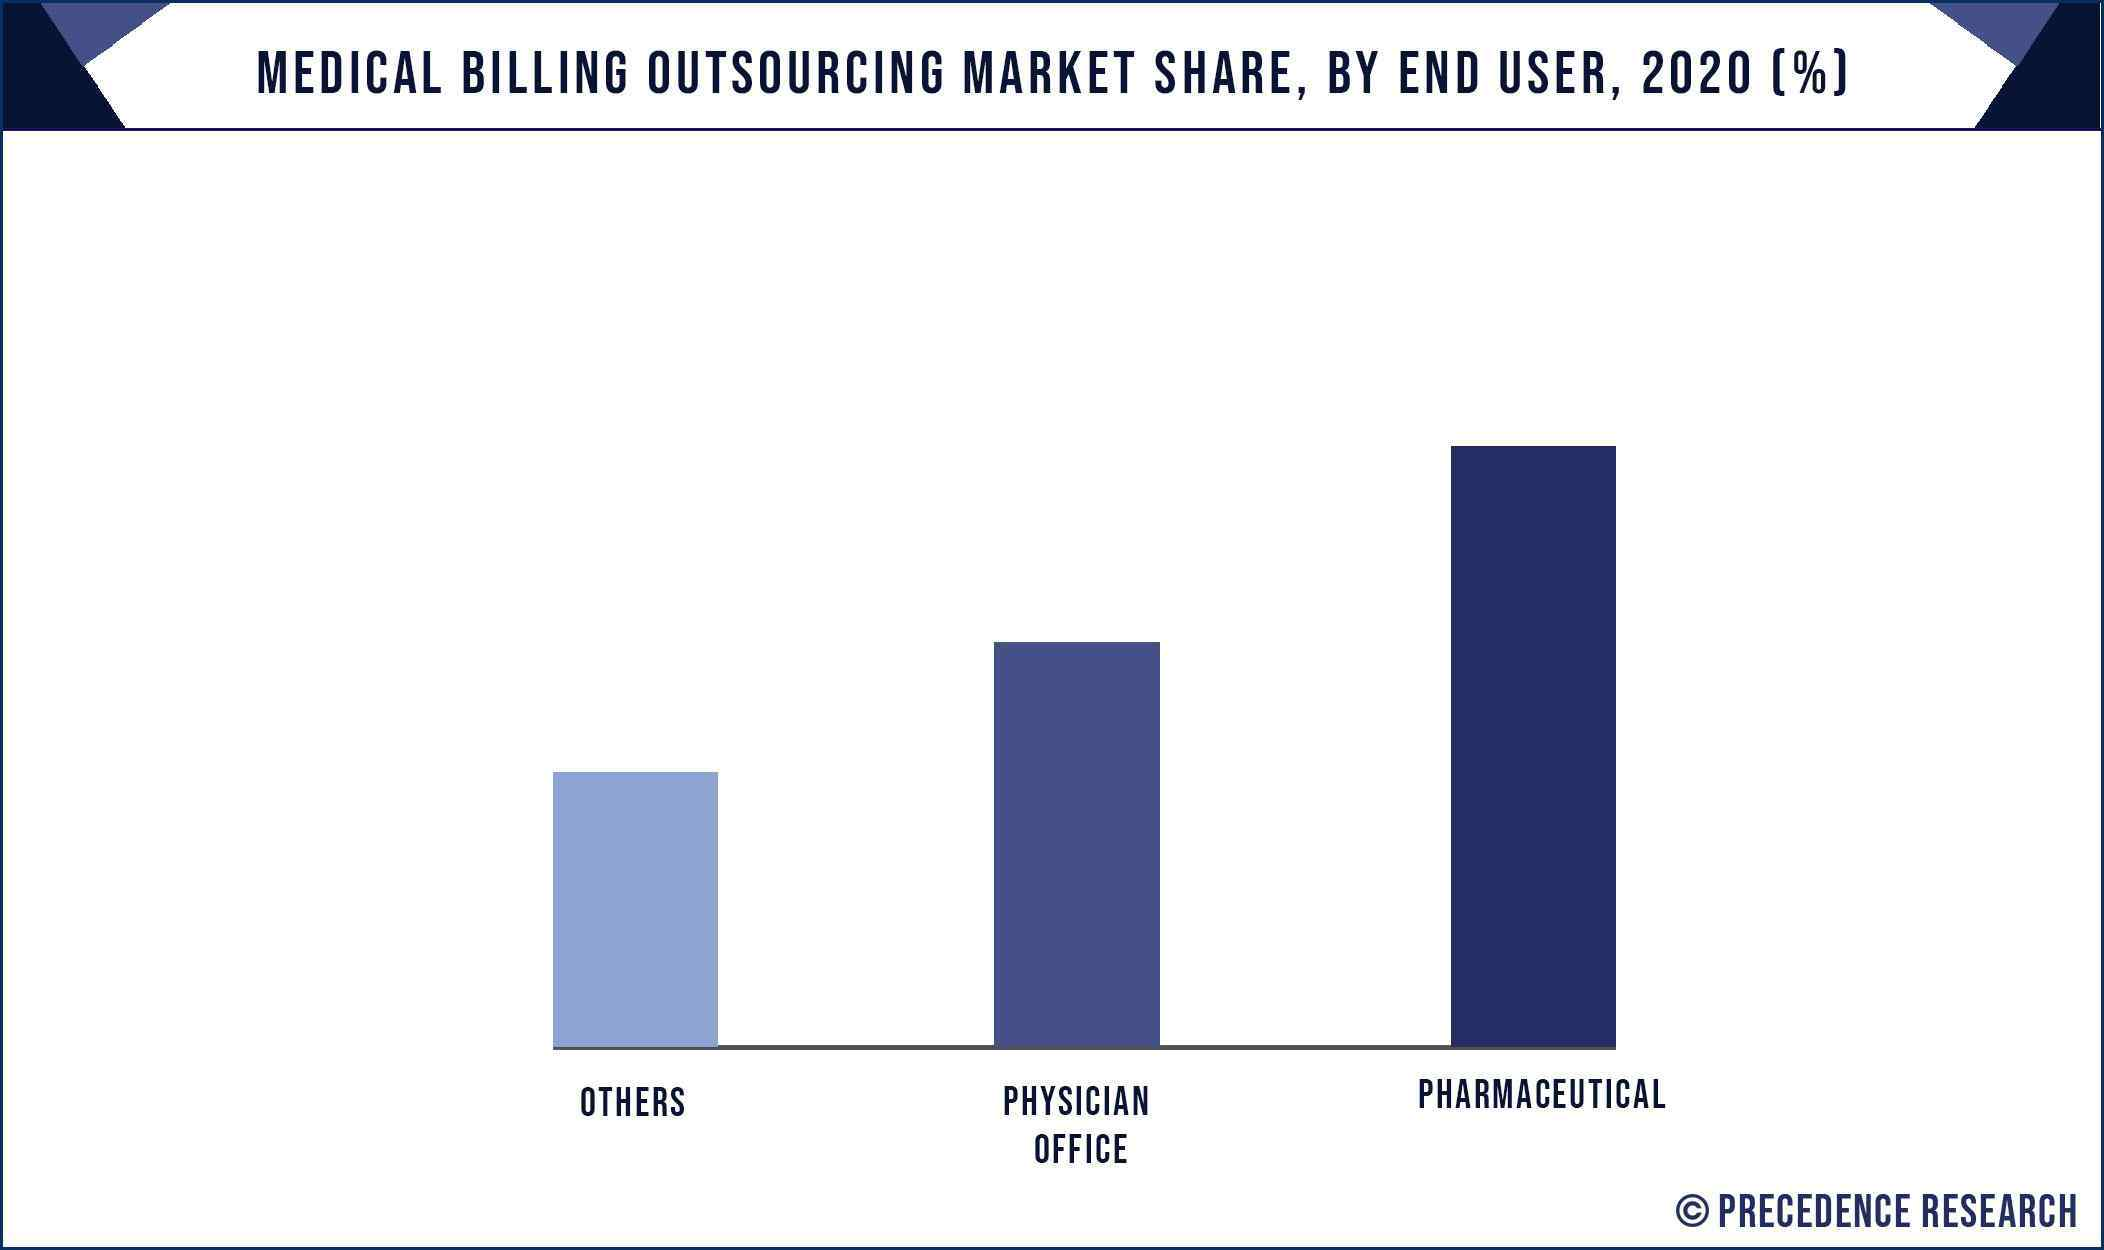 Medical Billing Outsourcing Market Share, By End User, 2020 (%)